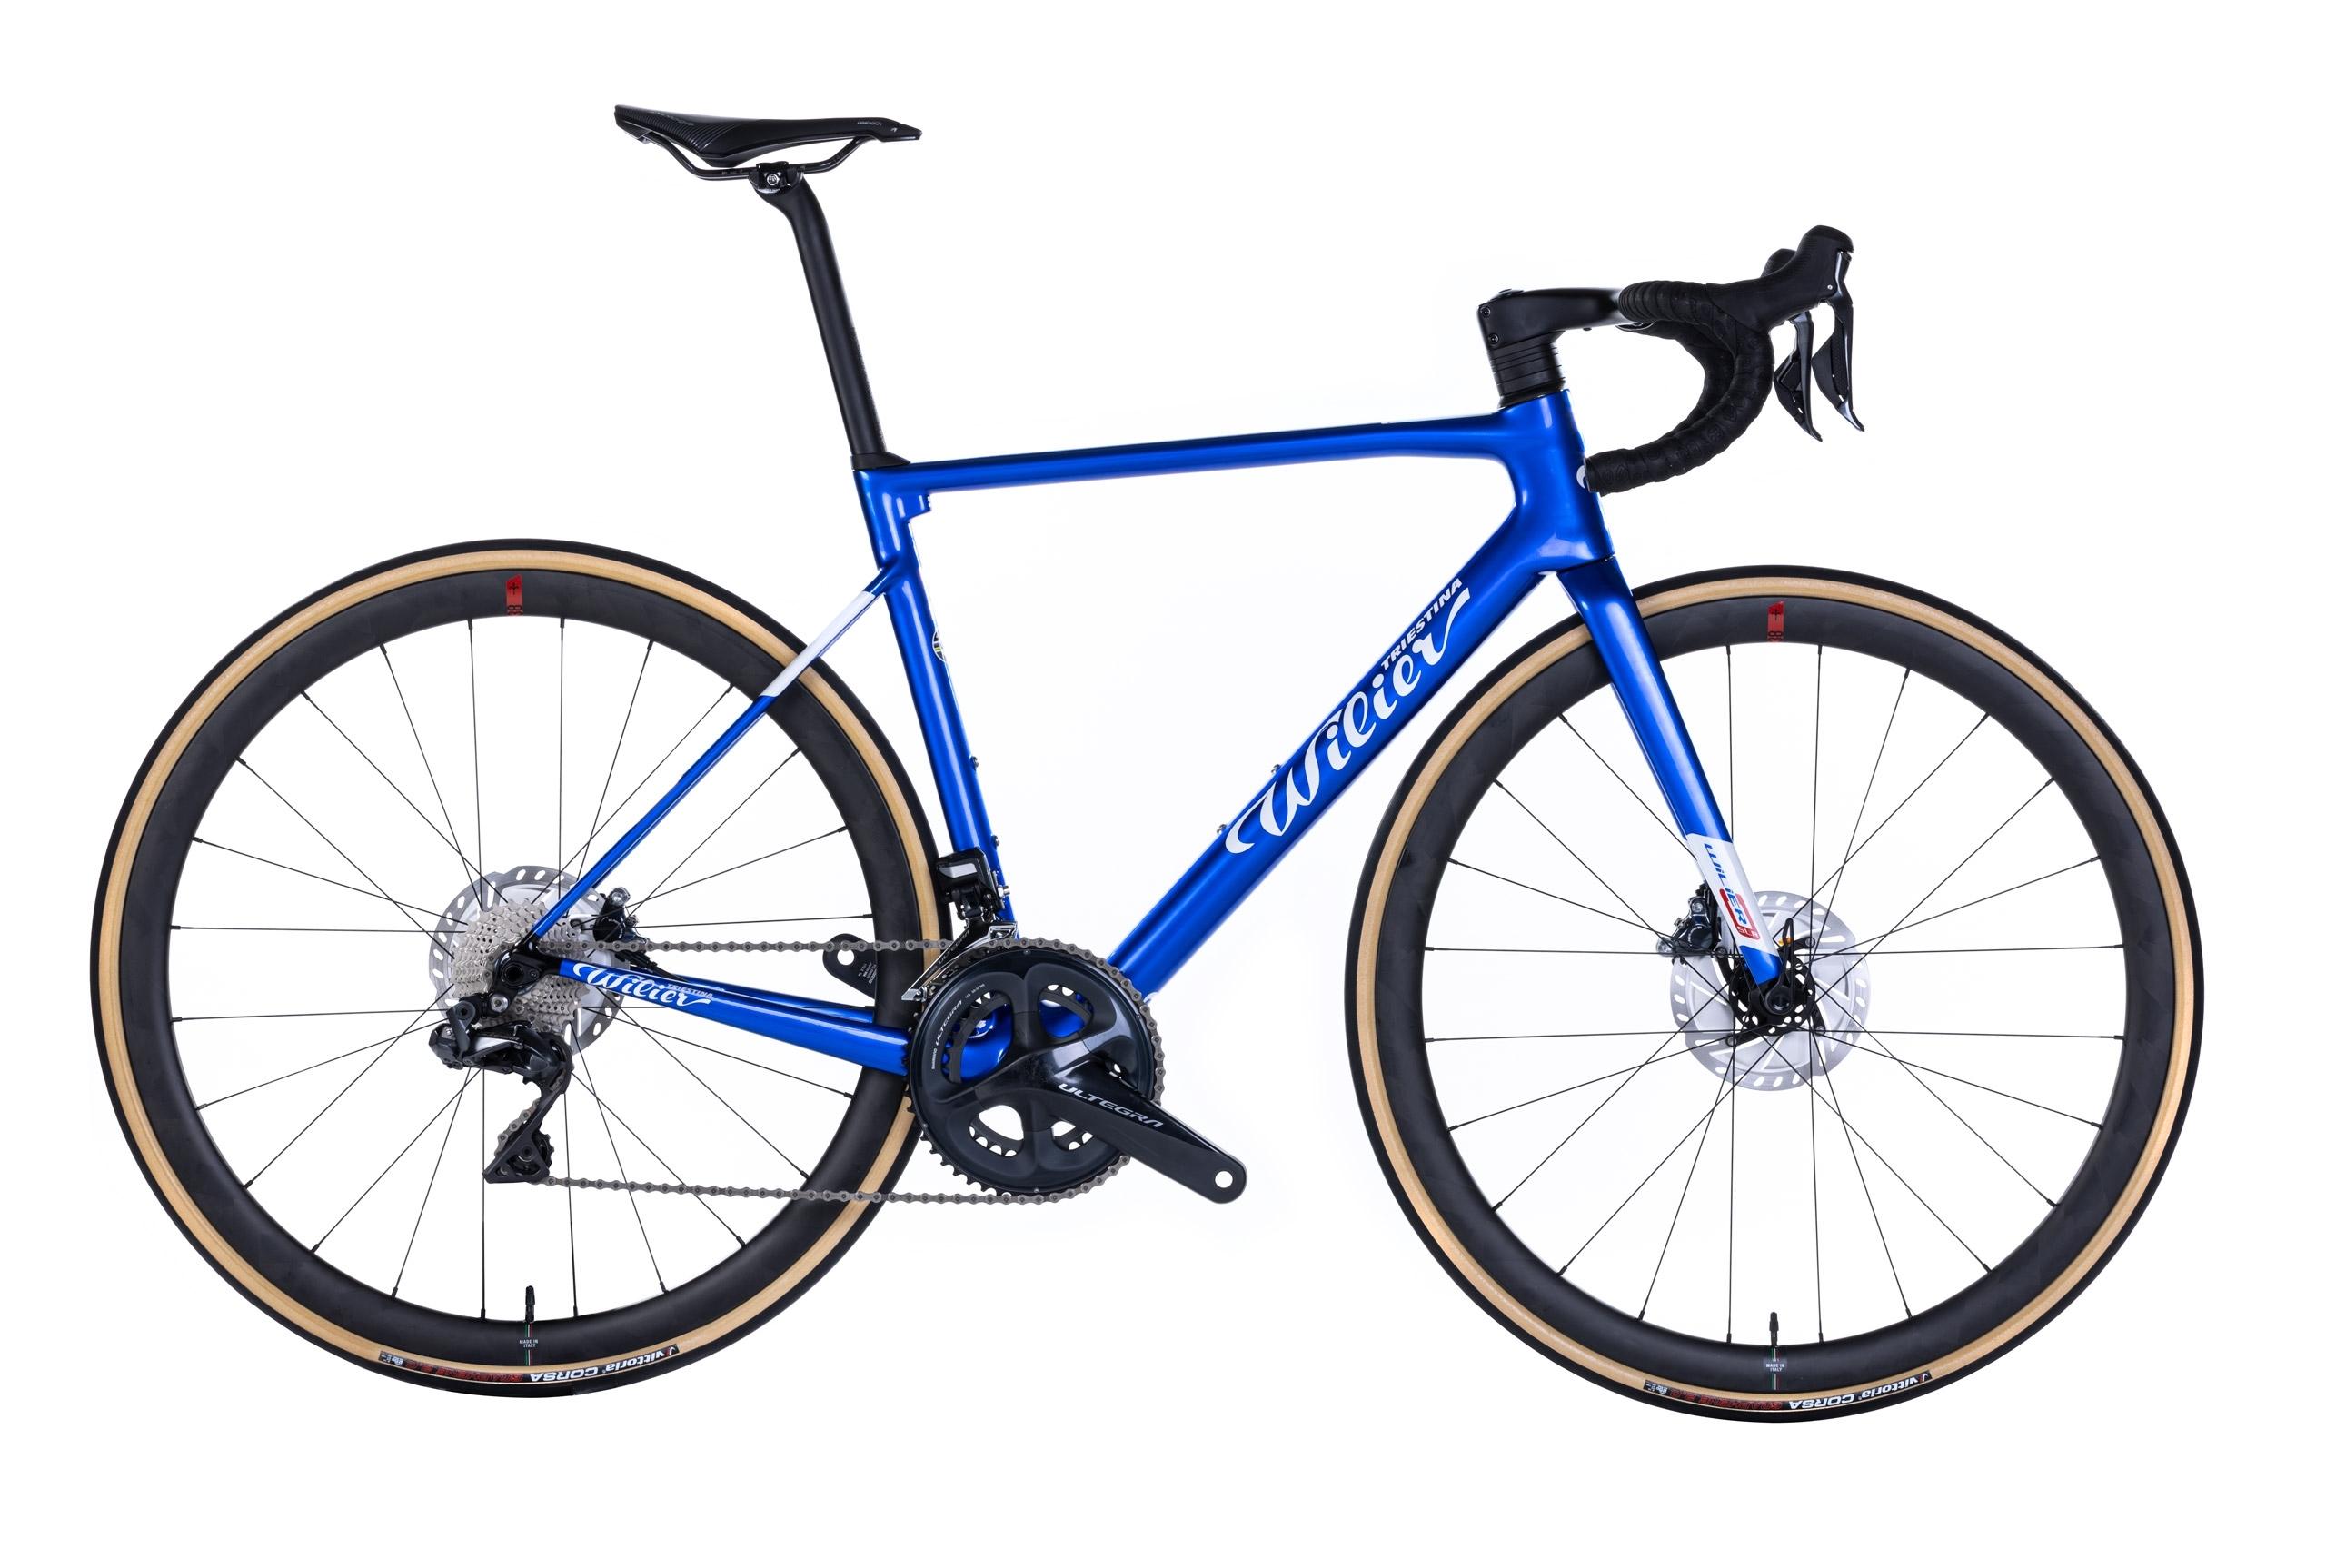 kolo ZERO SLR Disc + ULTEGRA Di2+SLR38 blue XL